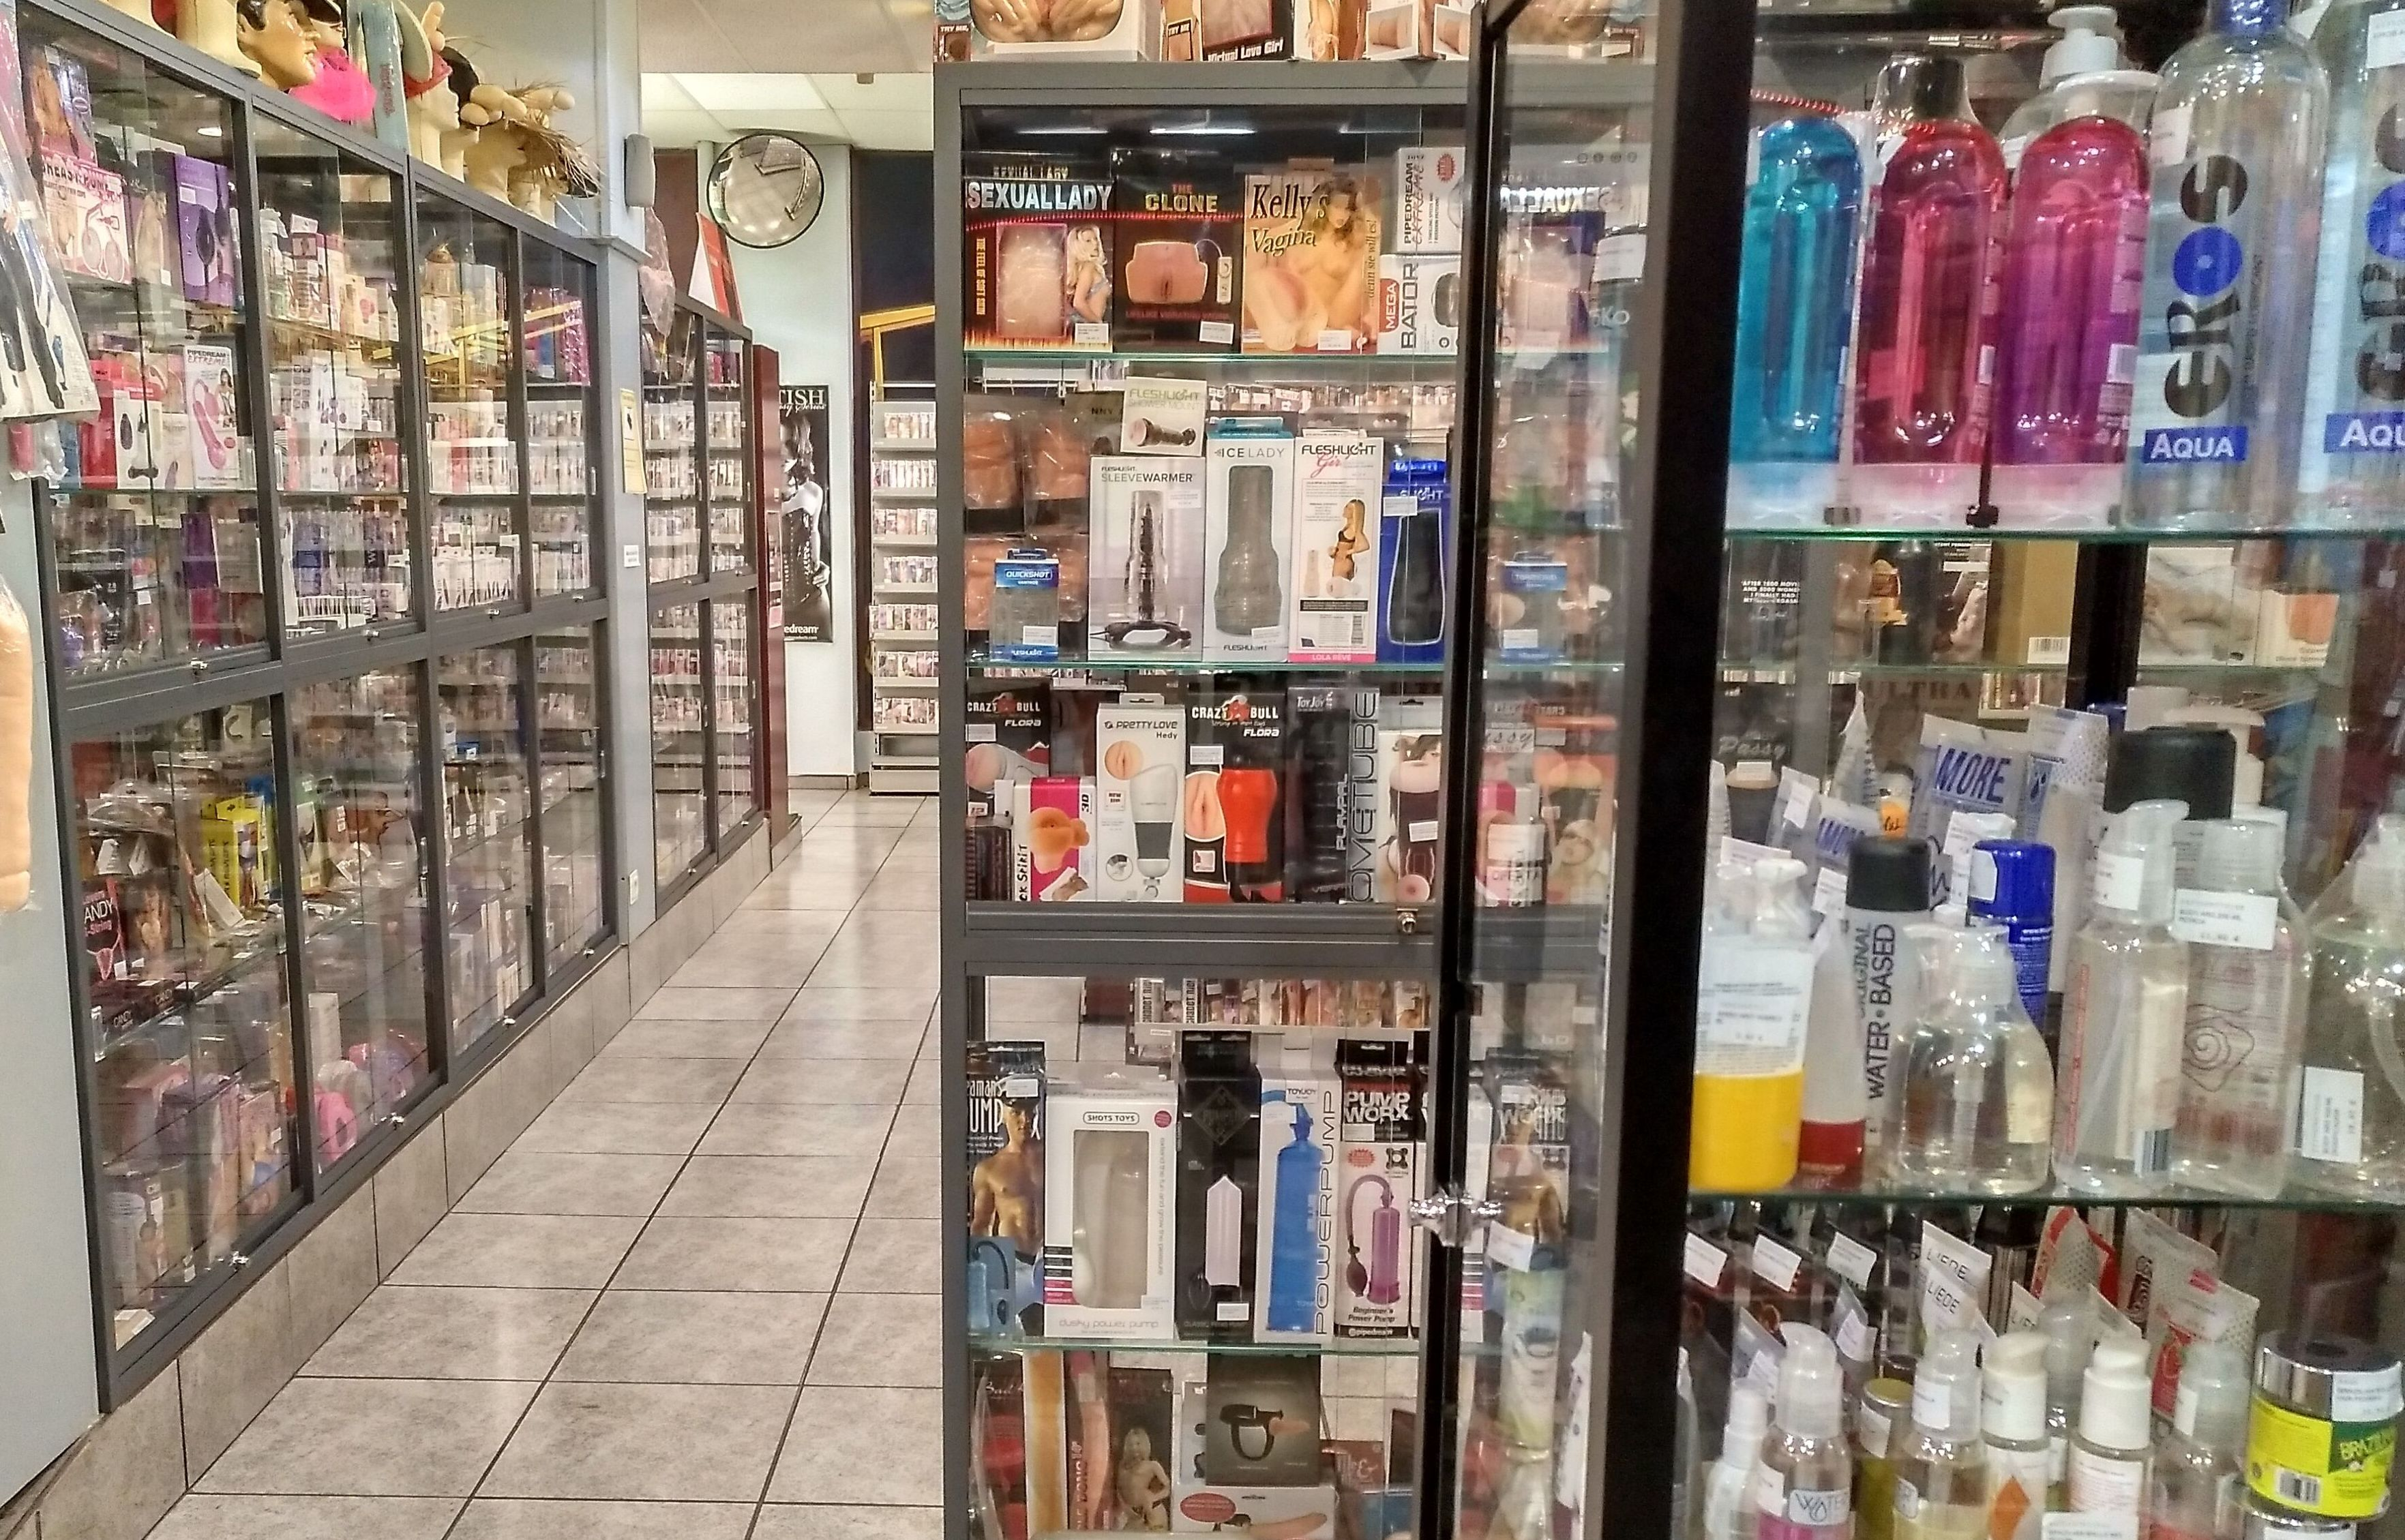 Foto 4 de Sex-shops en  | SEX MIL 1